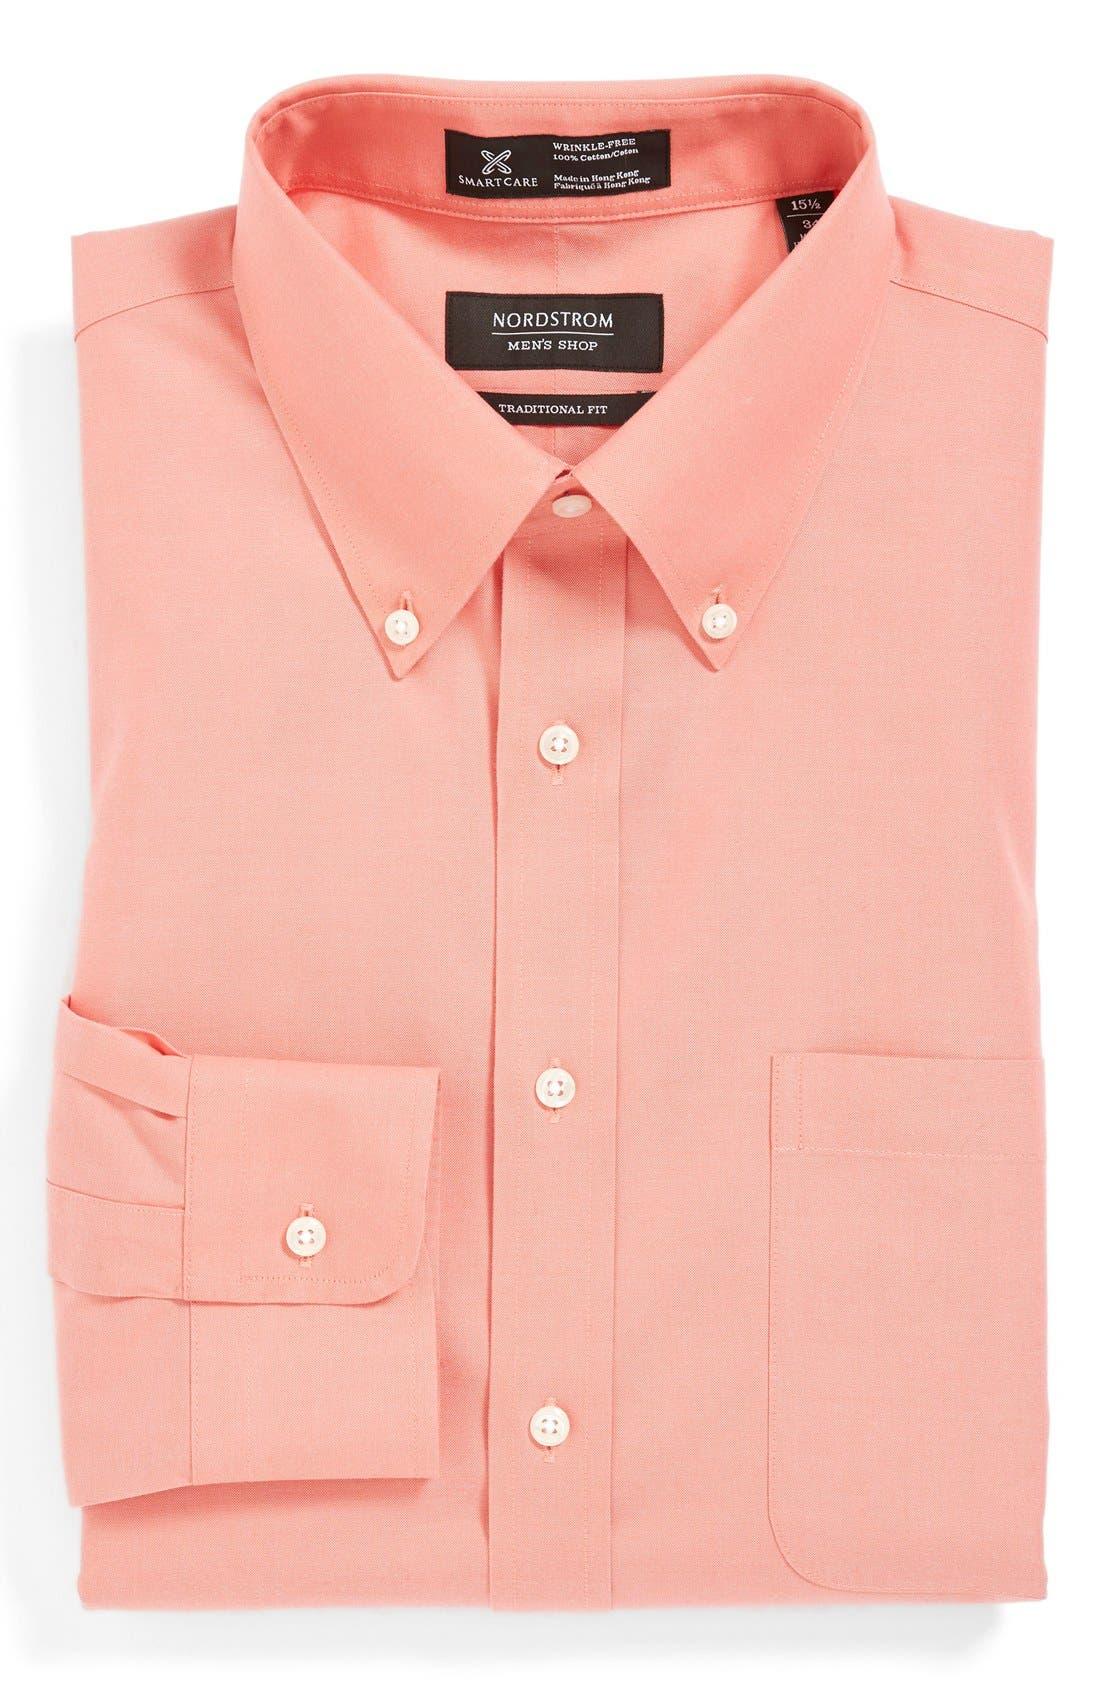 Alternate Image 1 Selected - Nordstrom Men's Shop Smartcare™ Traditional Fit Pinpoint Dress Shirt